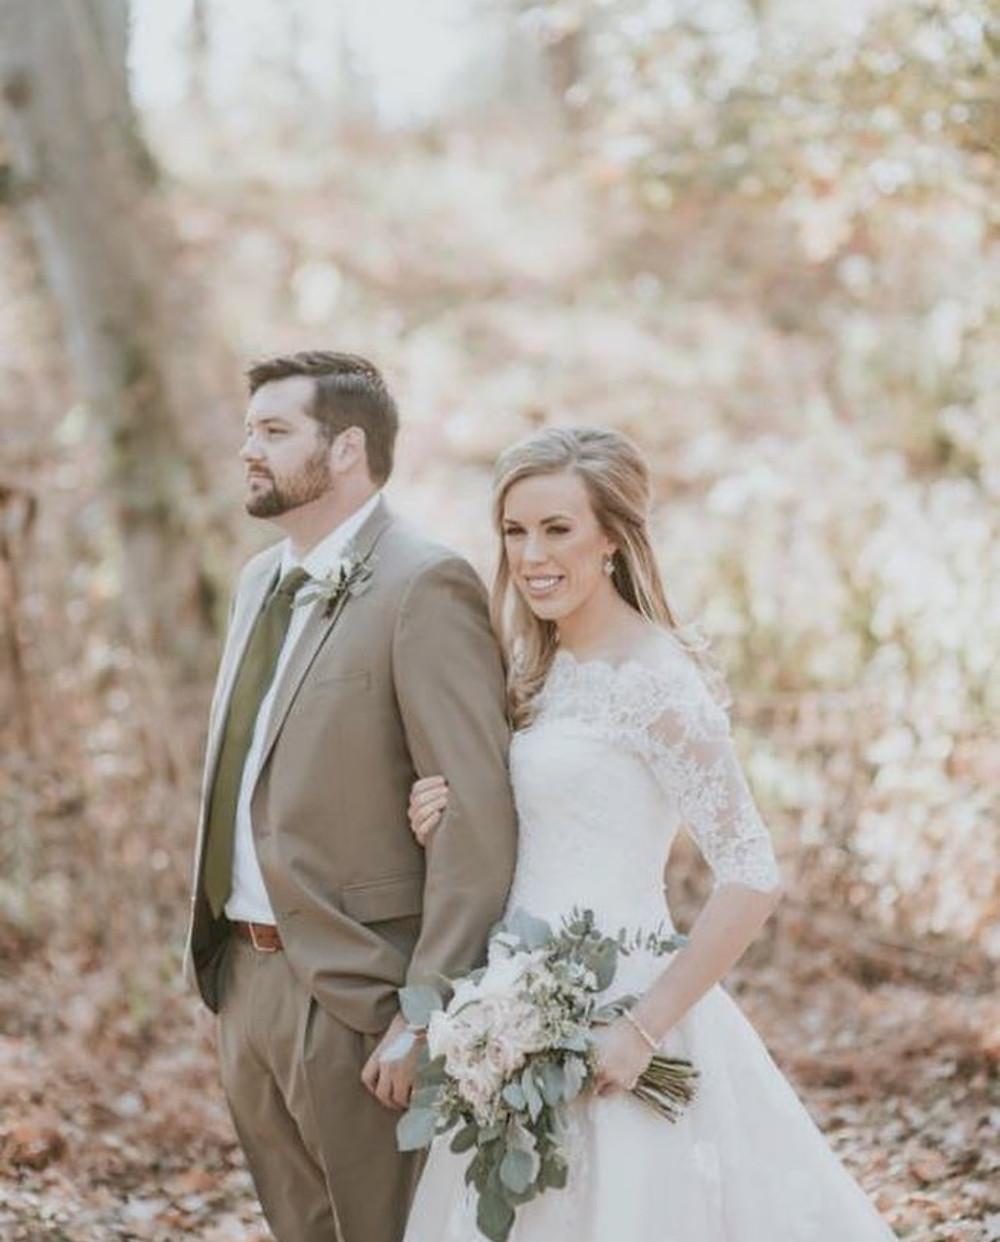 Eden Ingle Photo - Bride & Groom Nashville